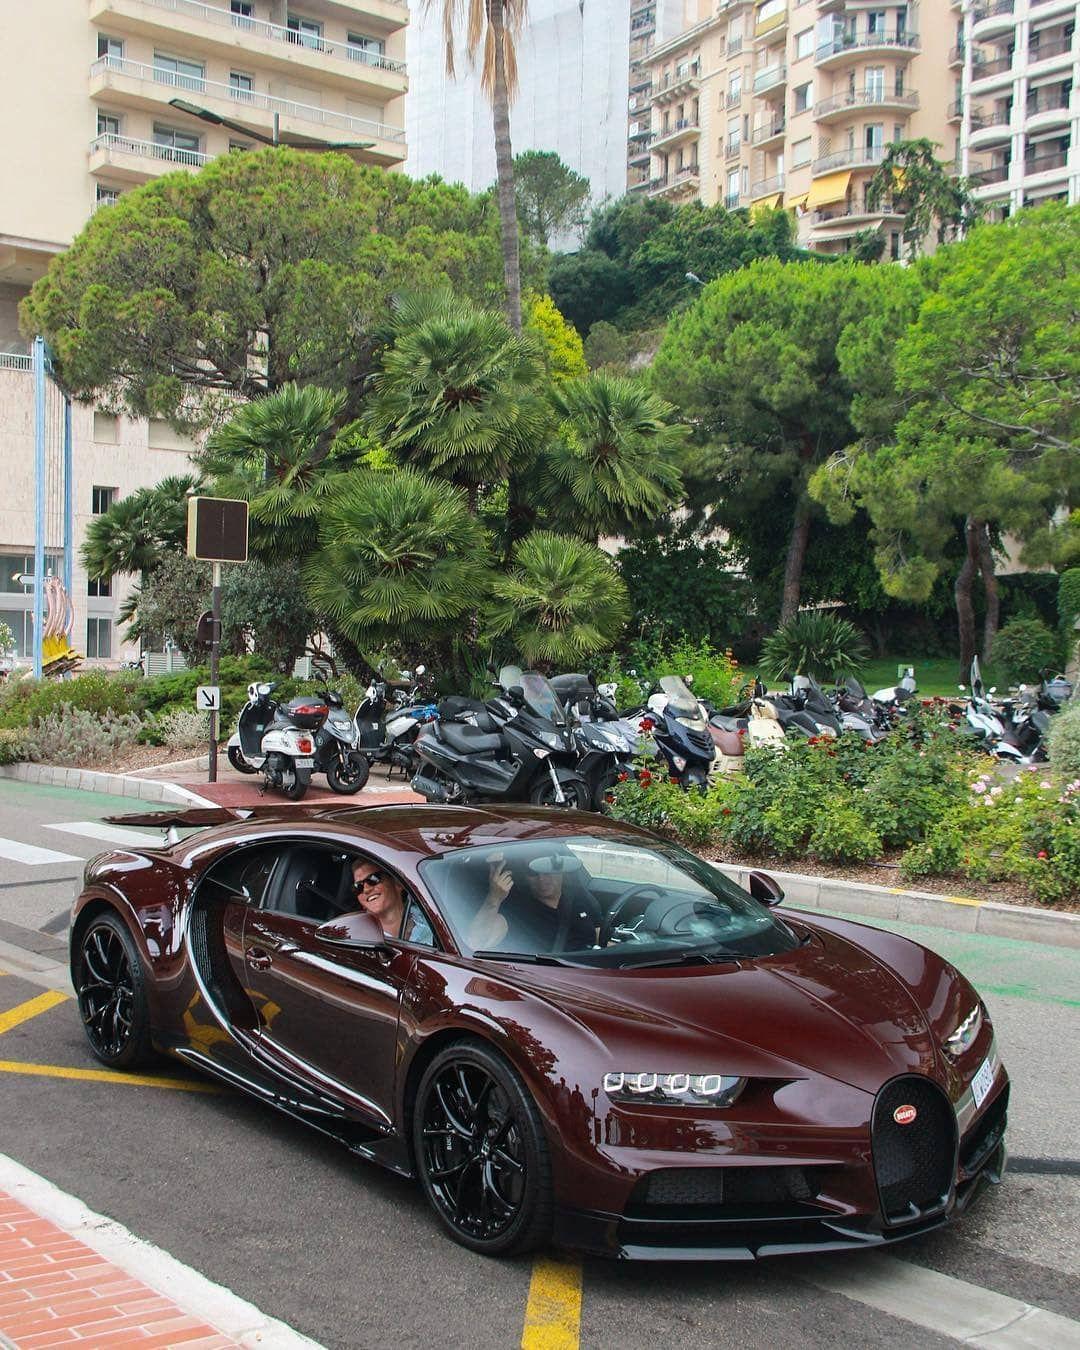 Bugatti In 2020 Luxury Car Photos Bugatti Chiron Bugatti Cars